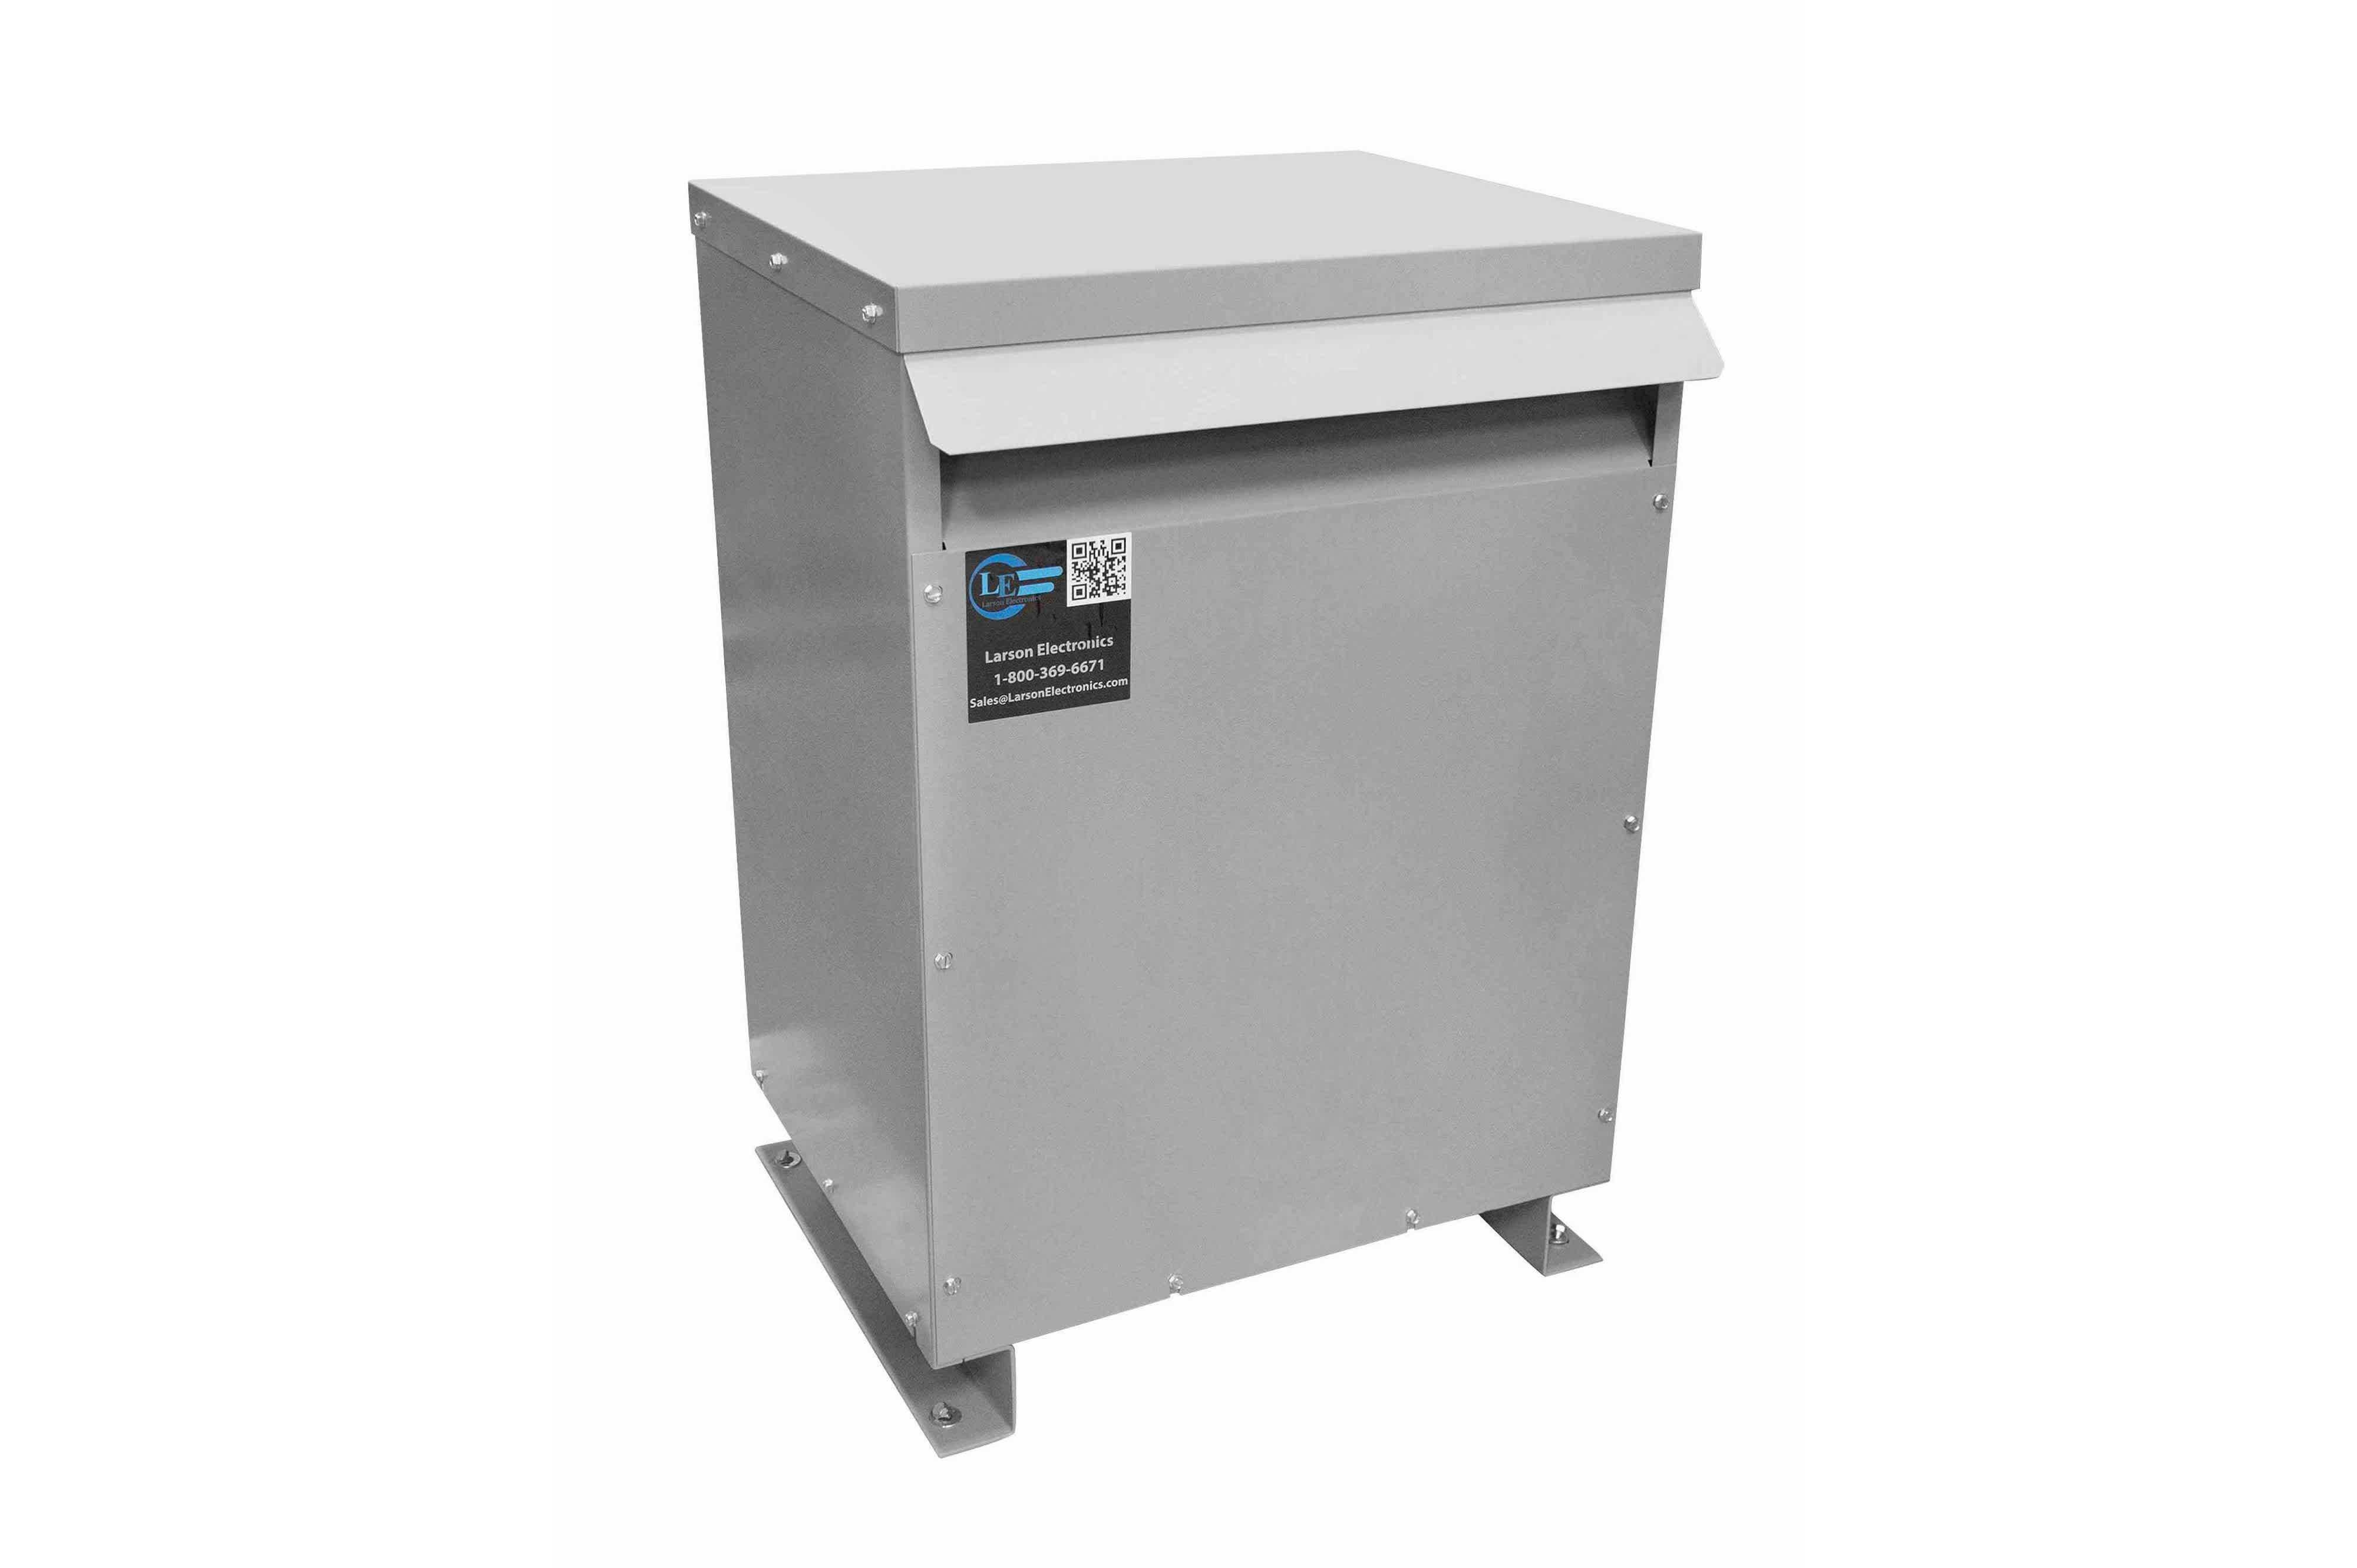 42.5 kVA 3PH Isolation Transformer, 460V Wye Primary, 400Y/231 Wye-N Secondary, N3R, Ventilated, 60 Hz